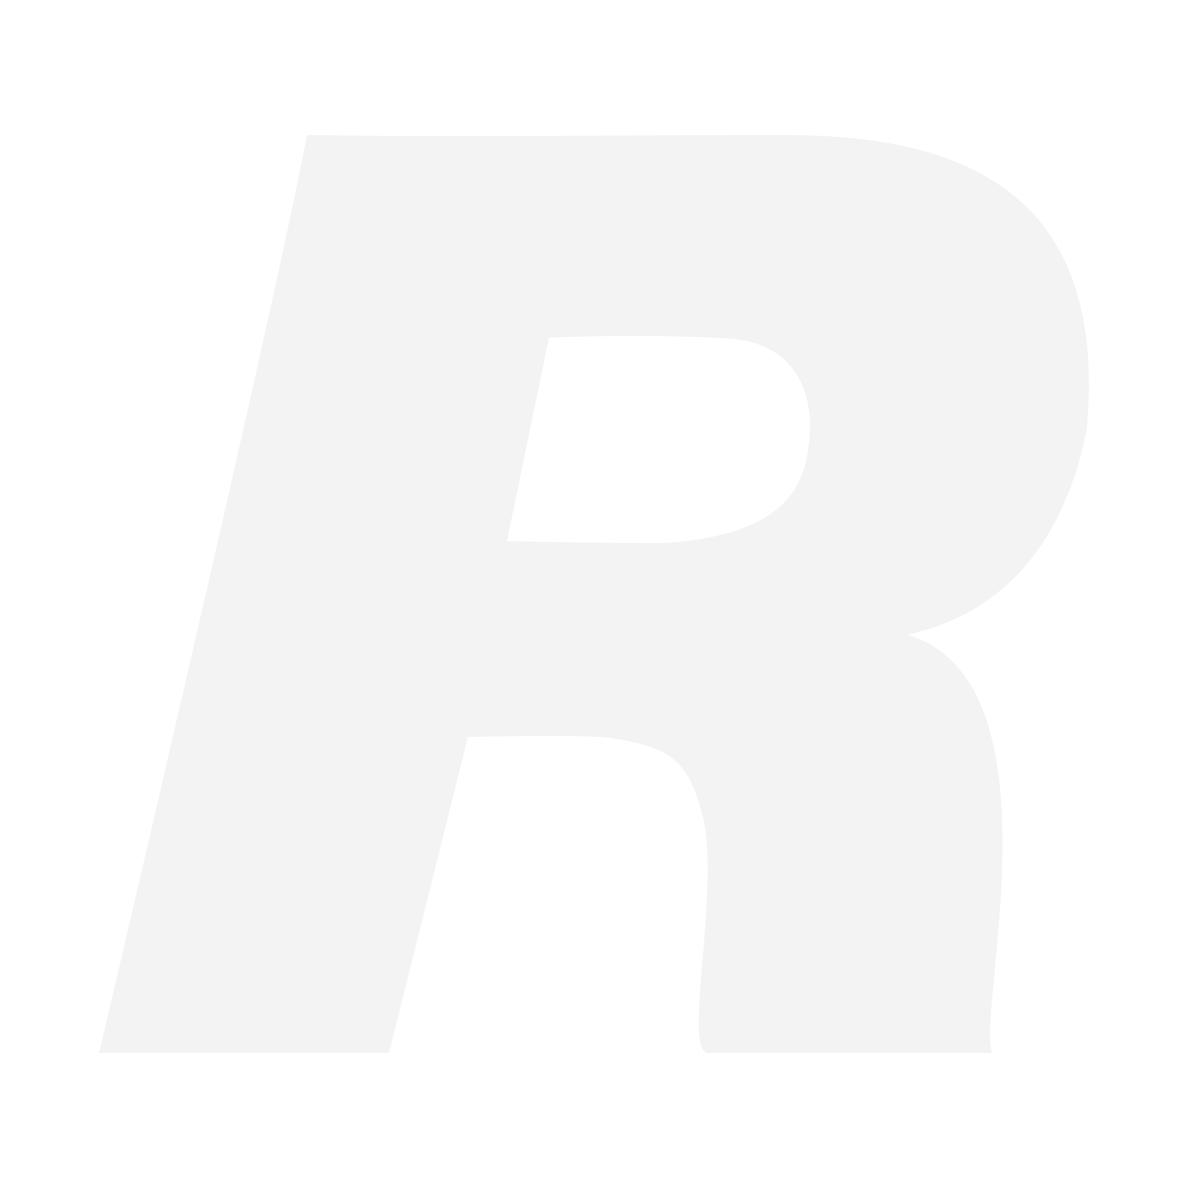 Rode WS6 Deluxe Windshield (NTG-1, NTG-2, VideoMic)